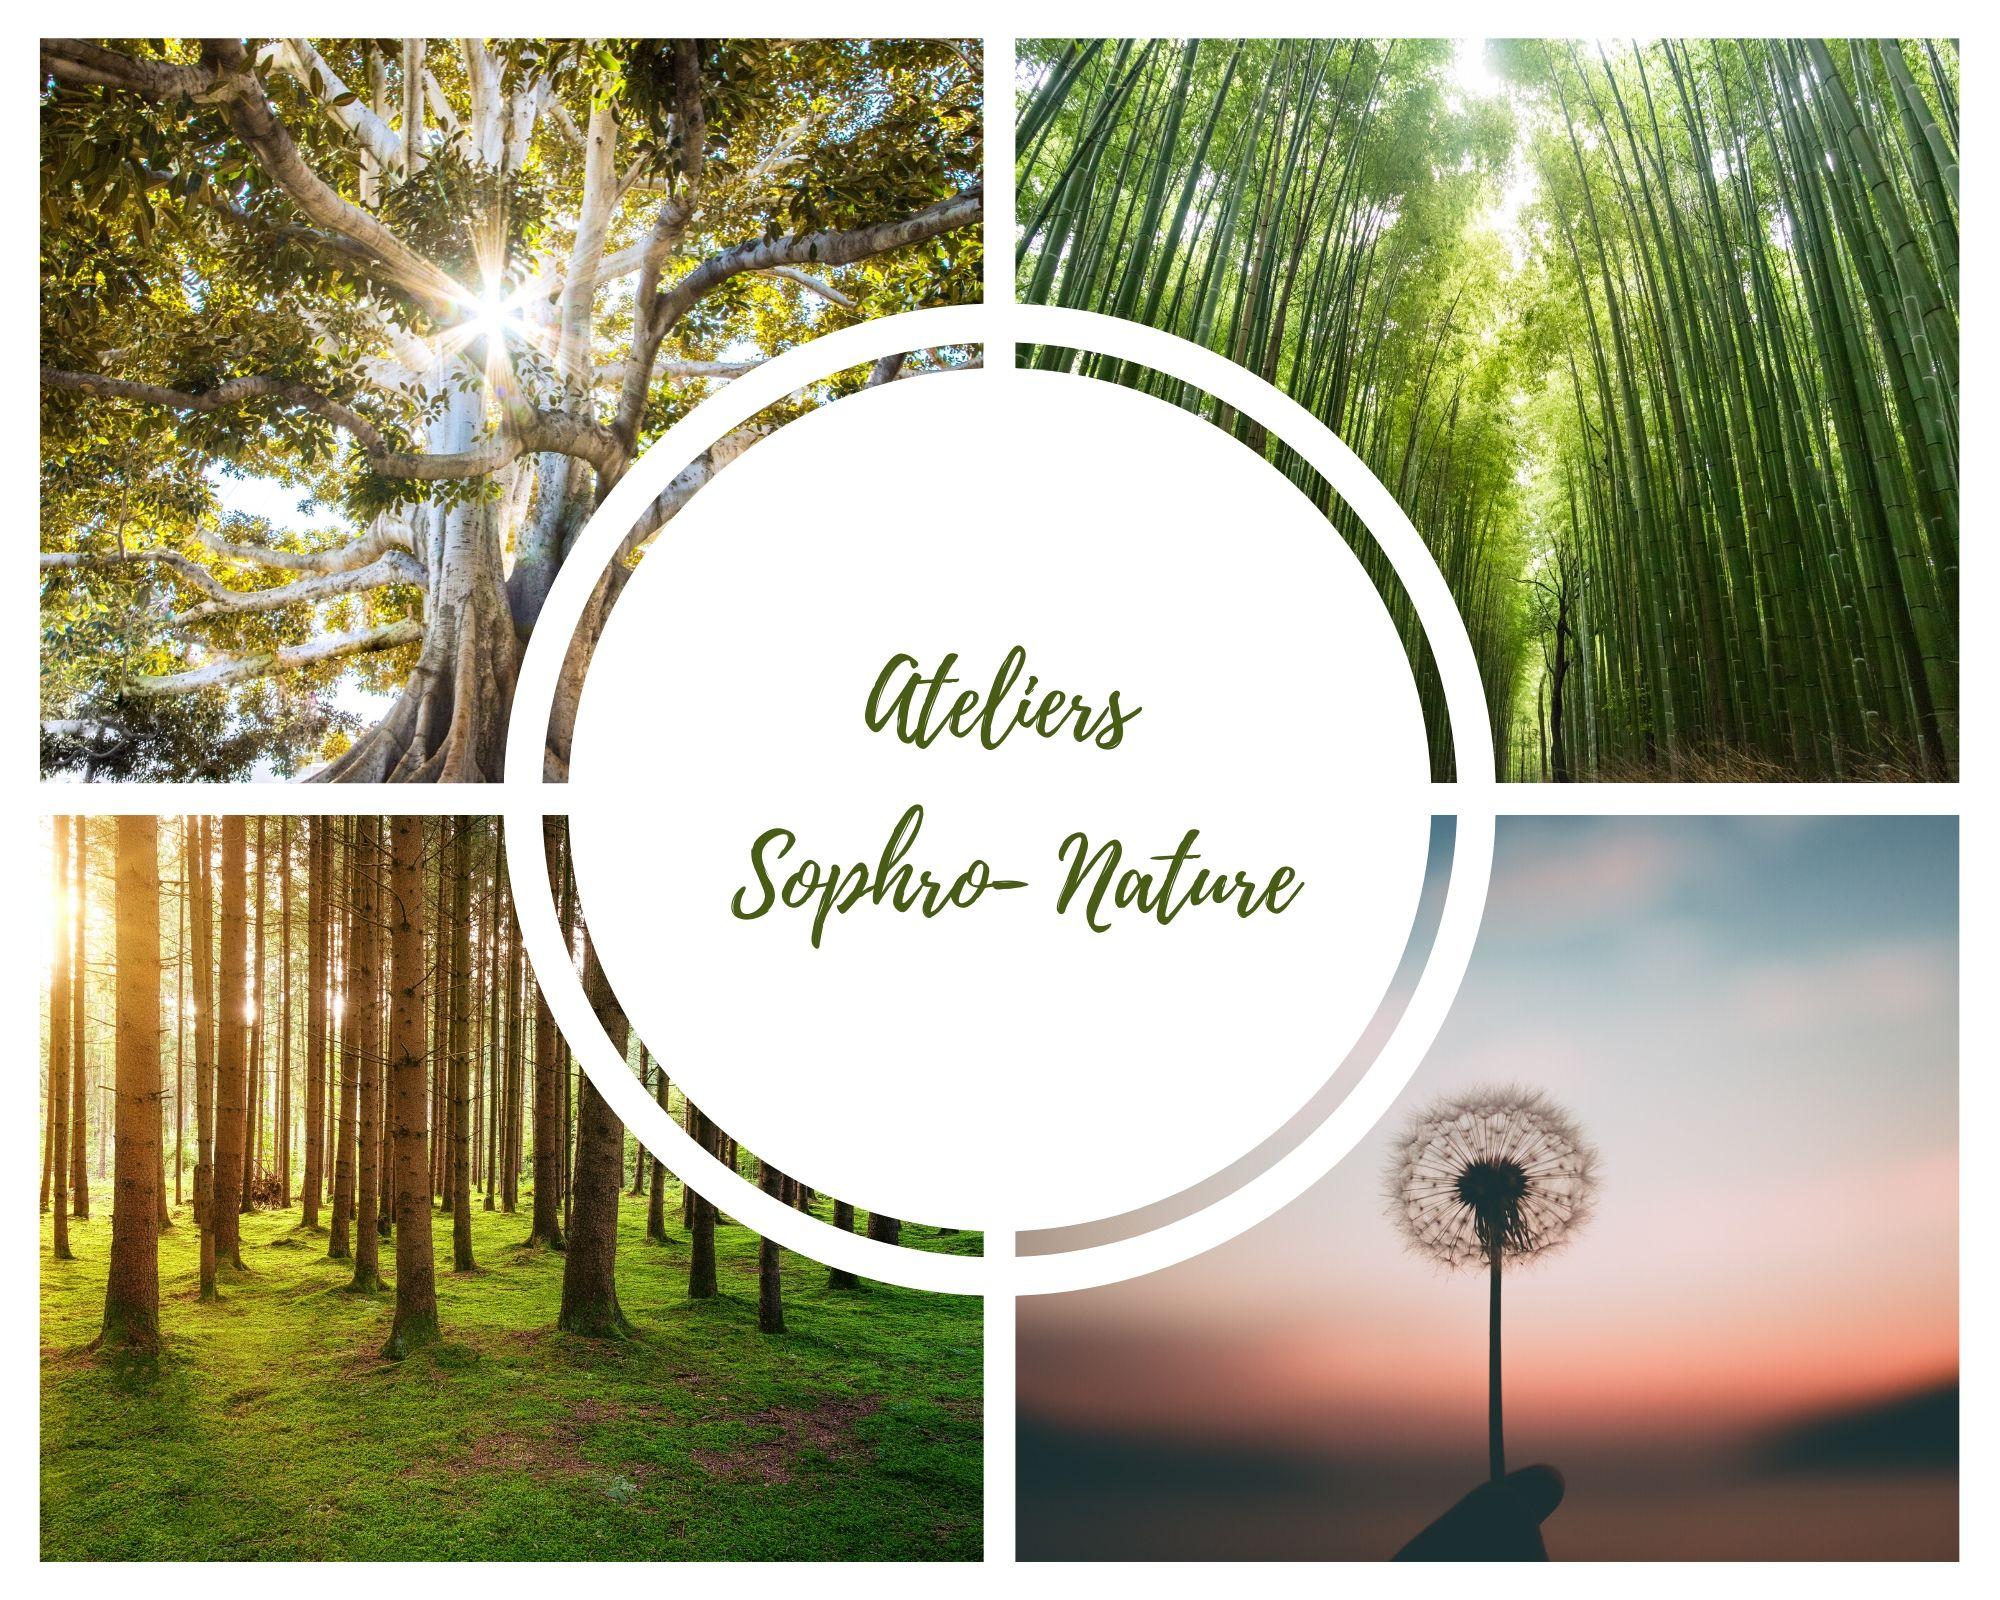 atelier sophro nature